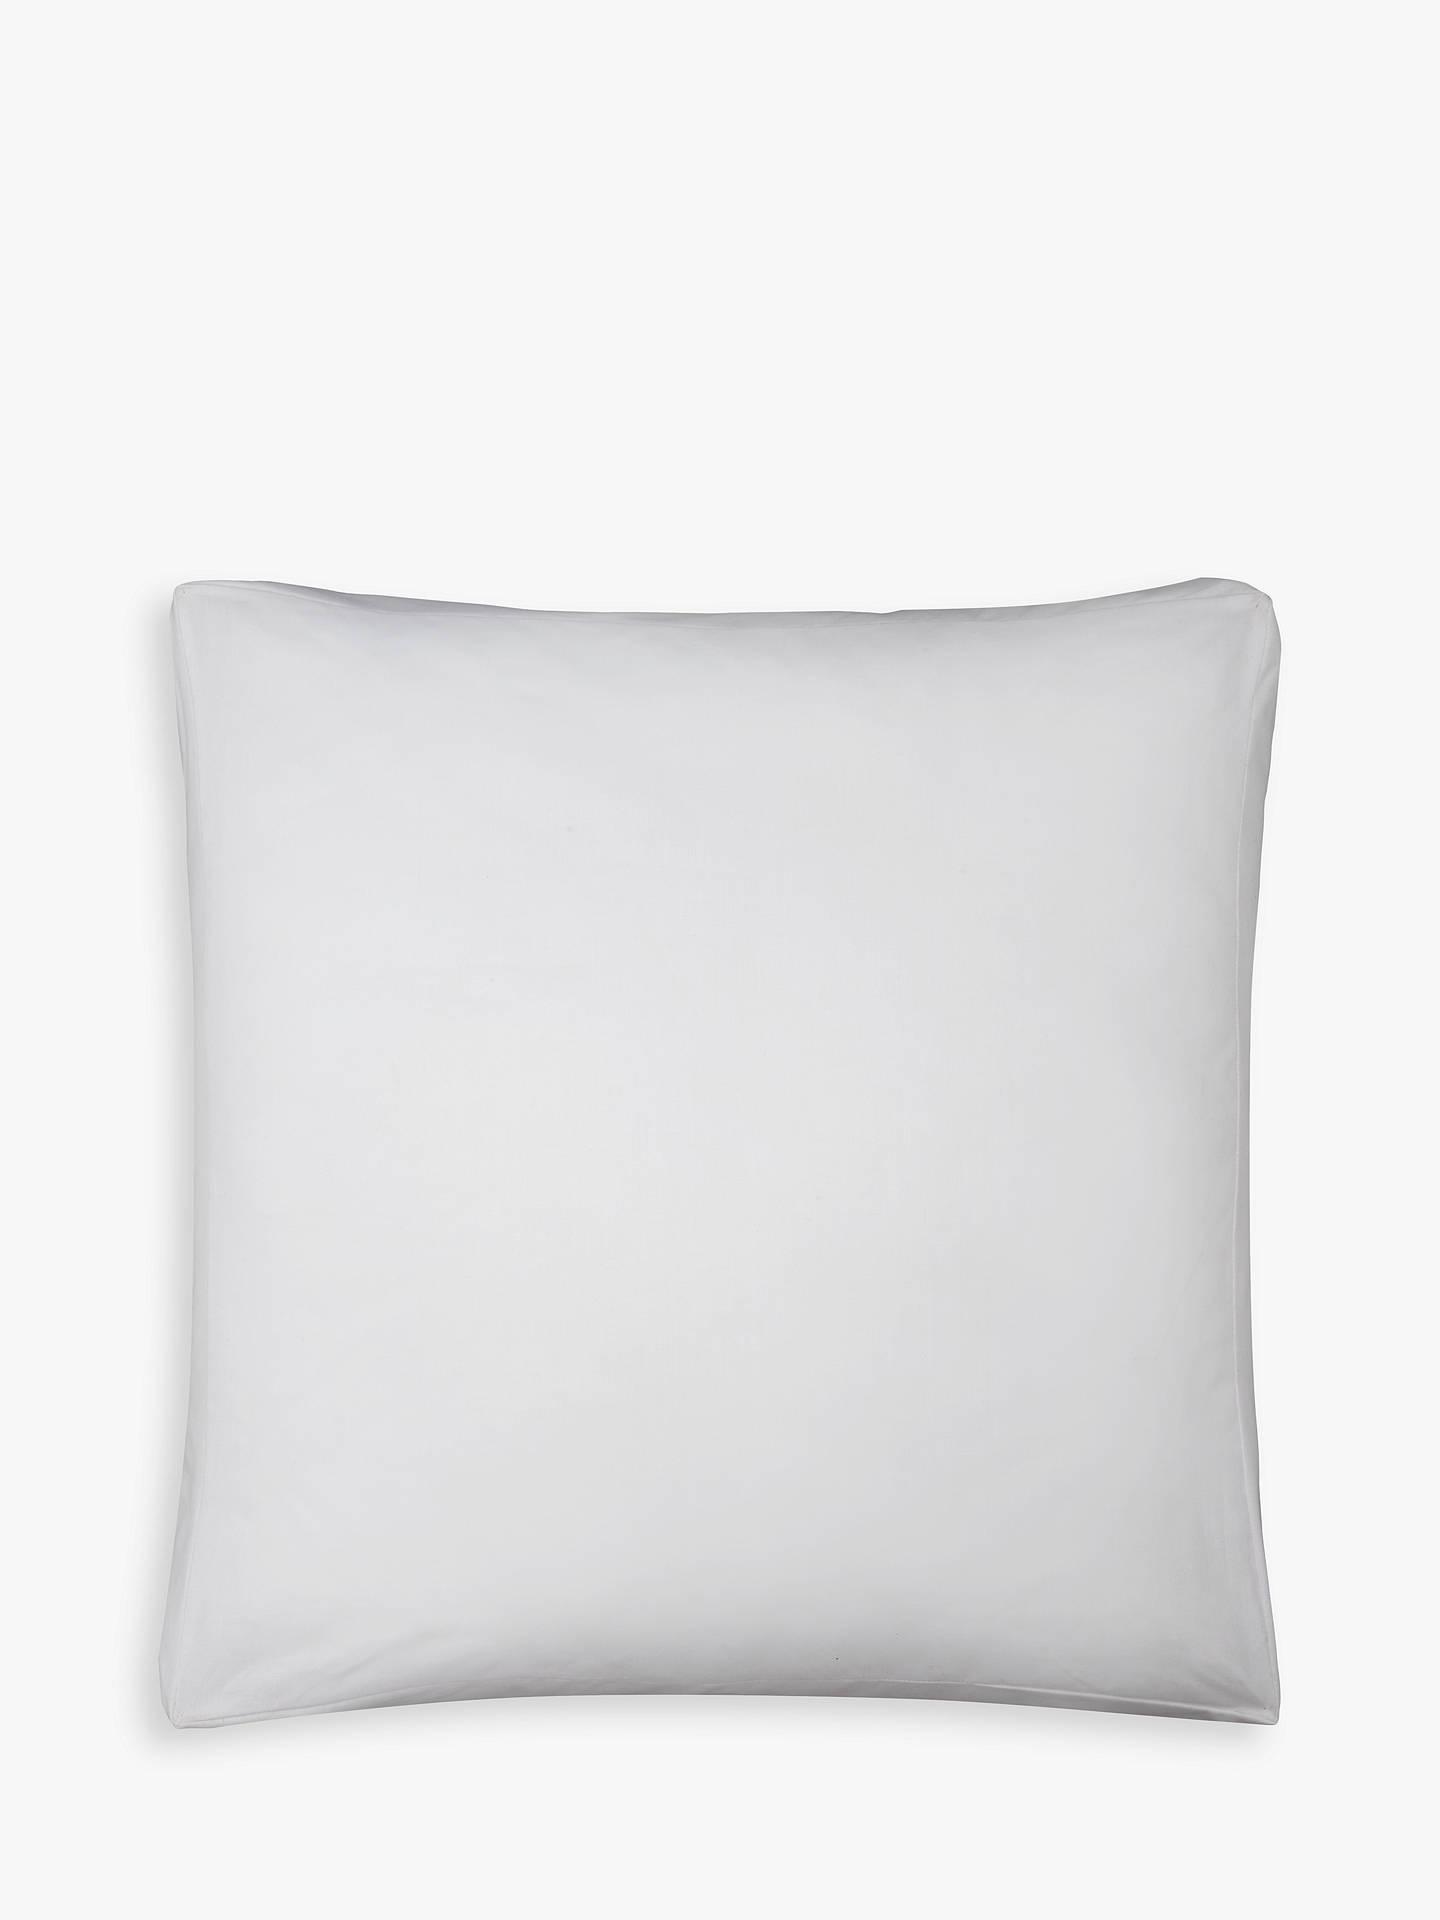 john lewis partners boxed polyester cushion pad at john. Black Bedroom Furniture Sets. Home Design Ideas